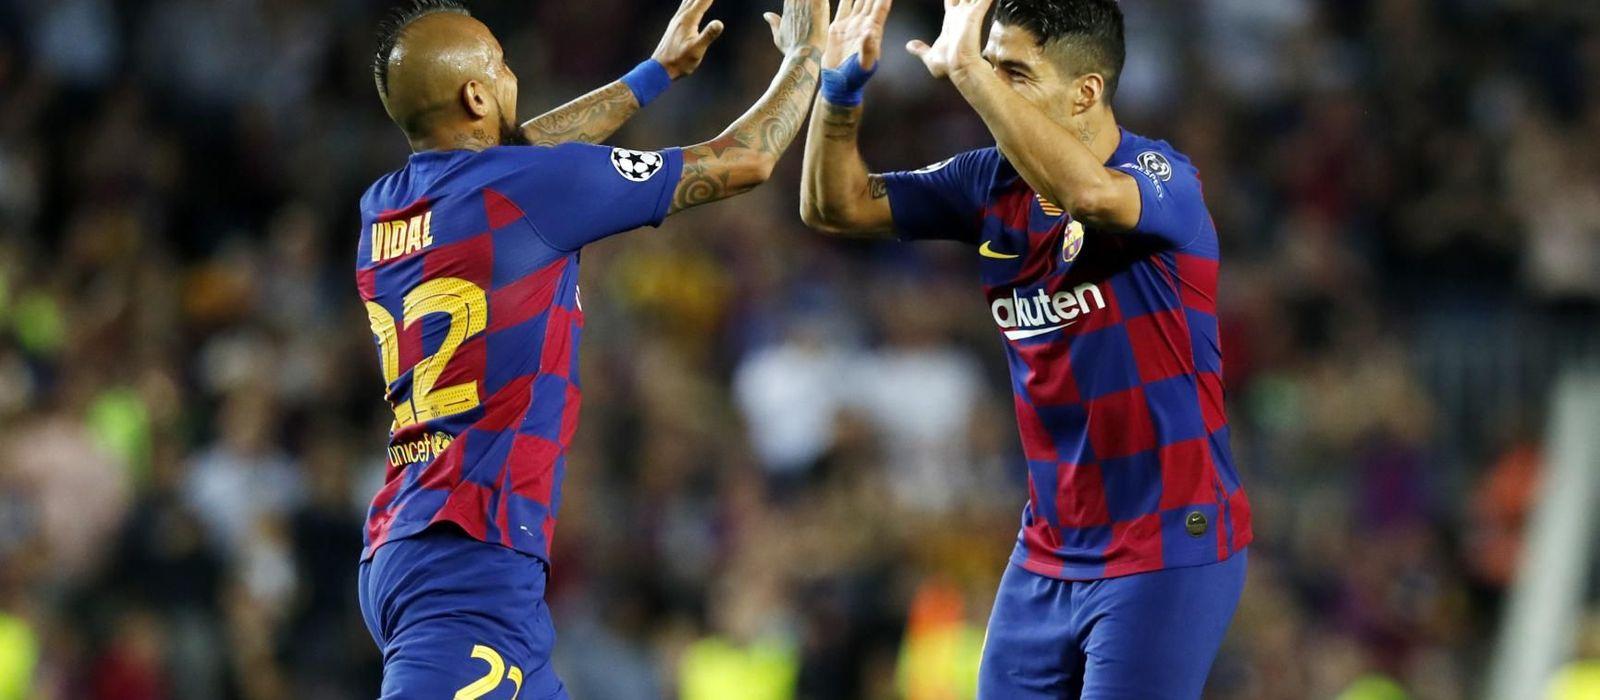 Vidal: 'I want it all'